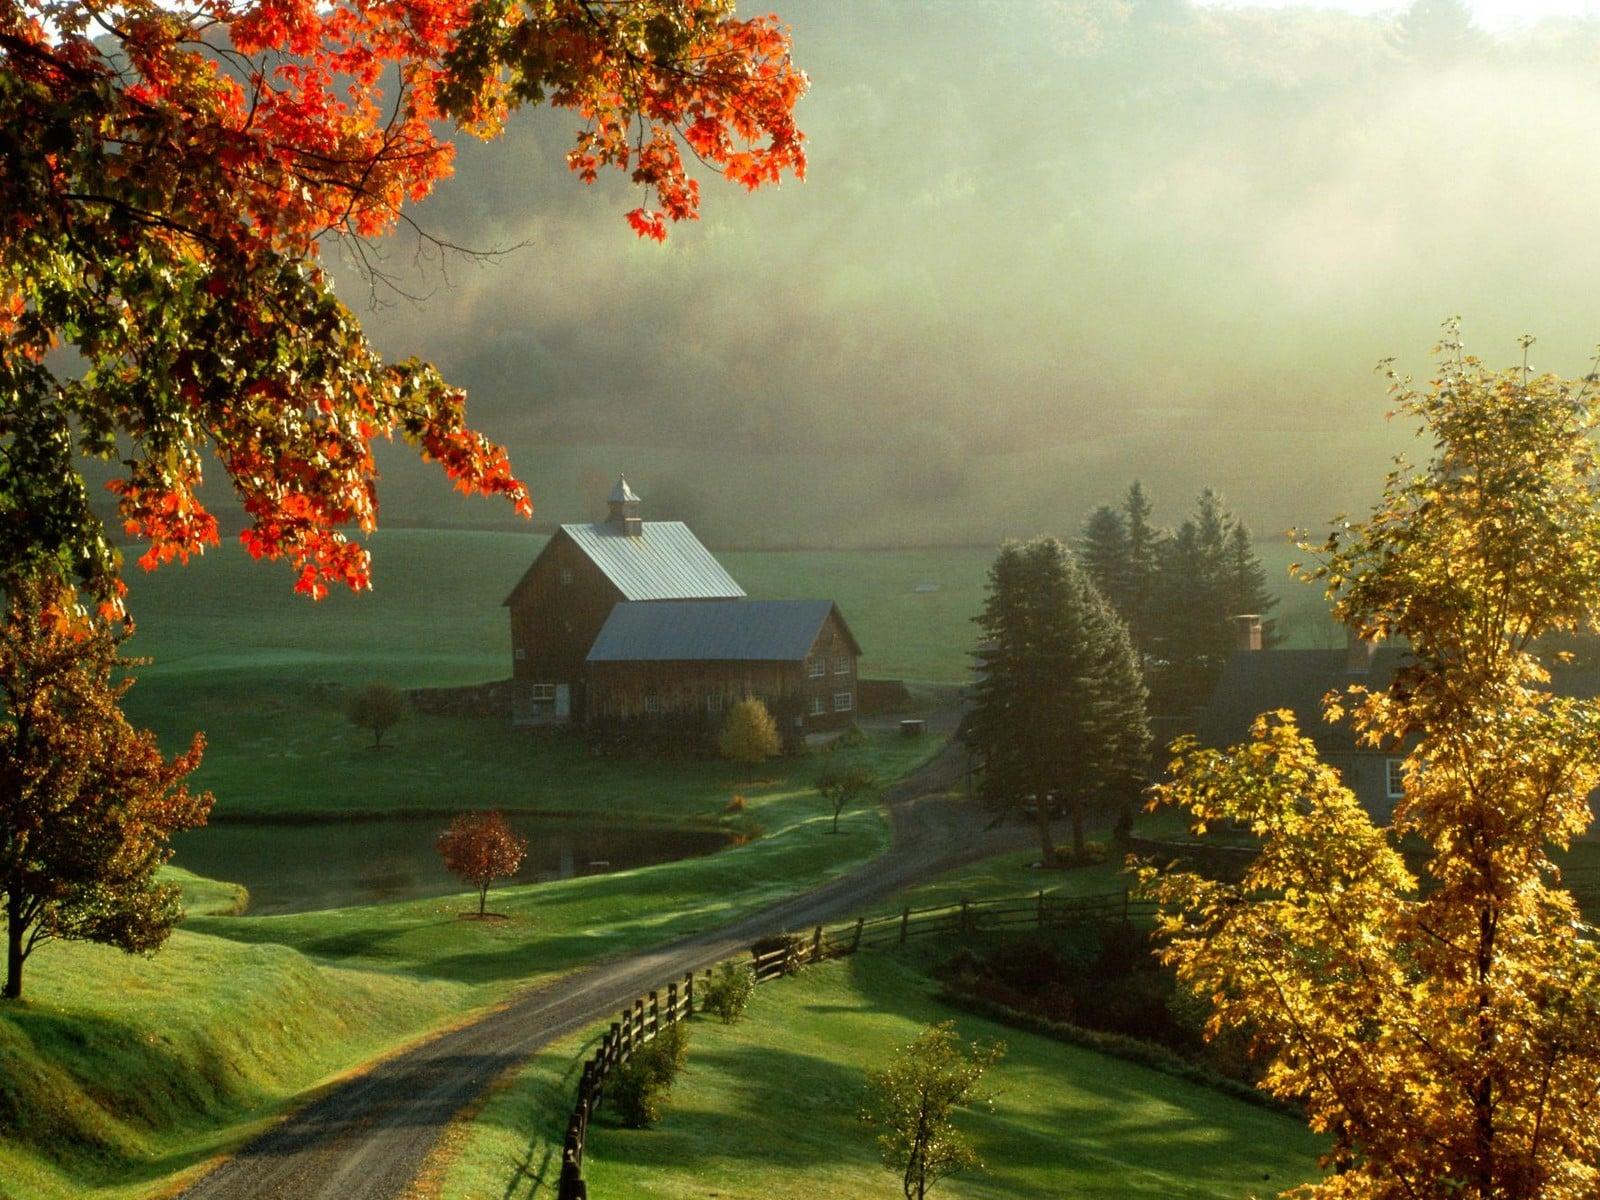 Köy Yerinde Puslu Sonbahar